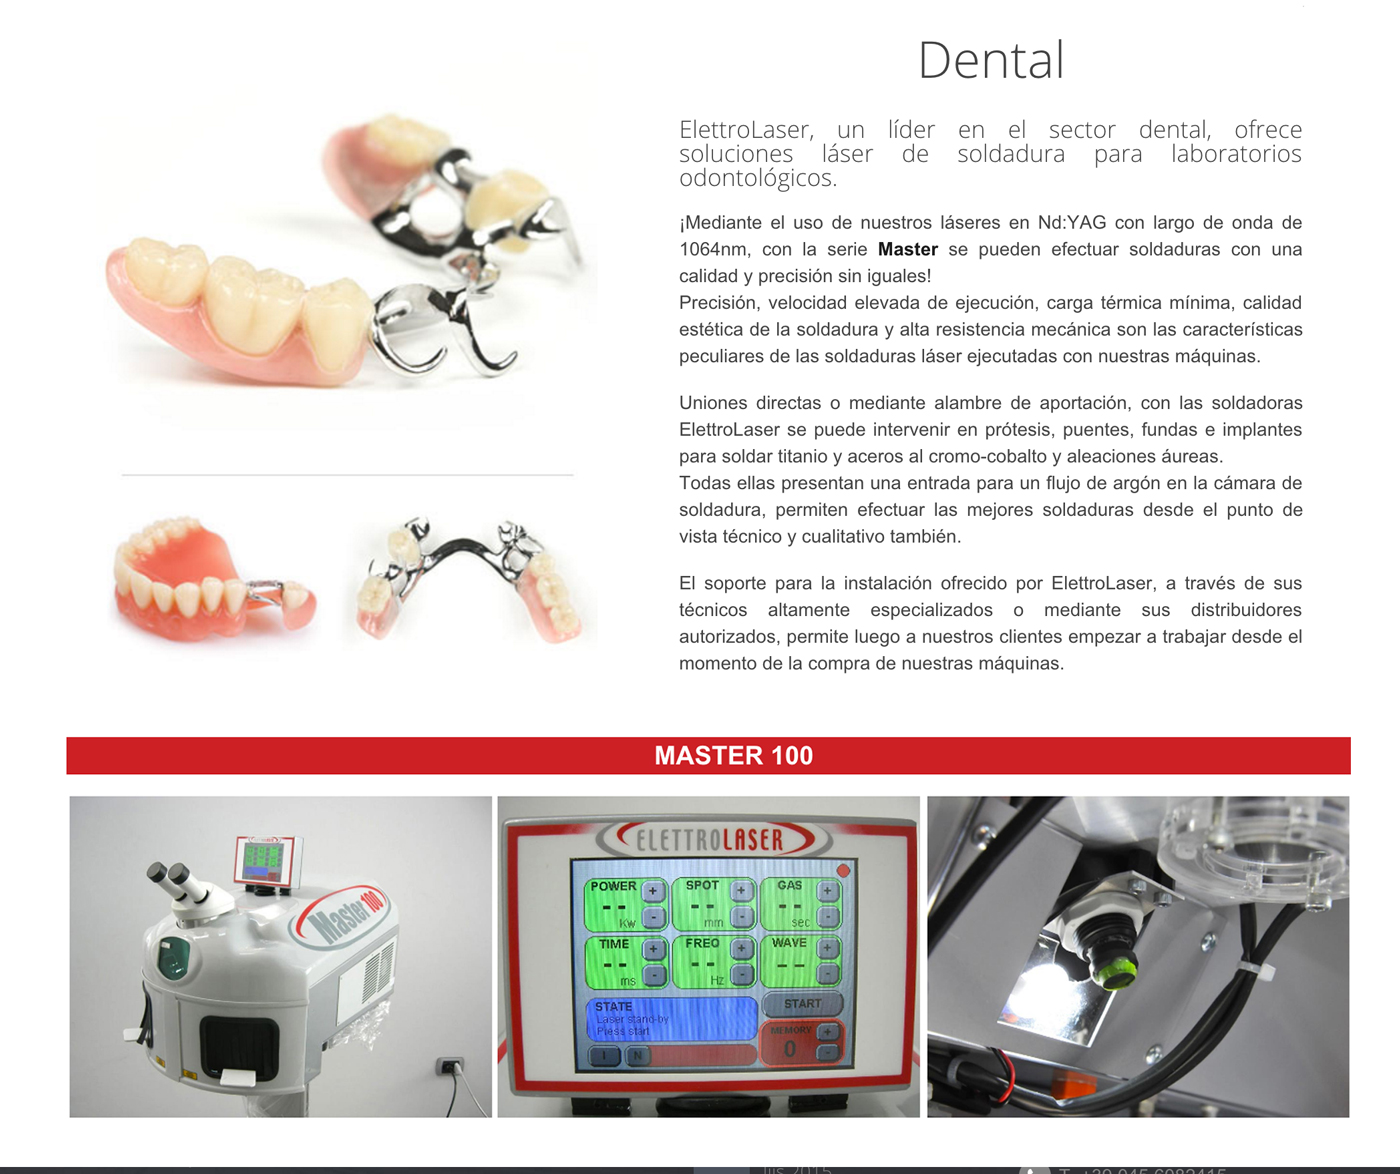 imagen-elettrolaser02